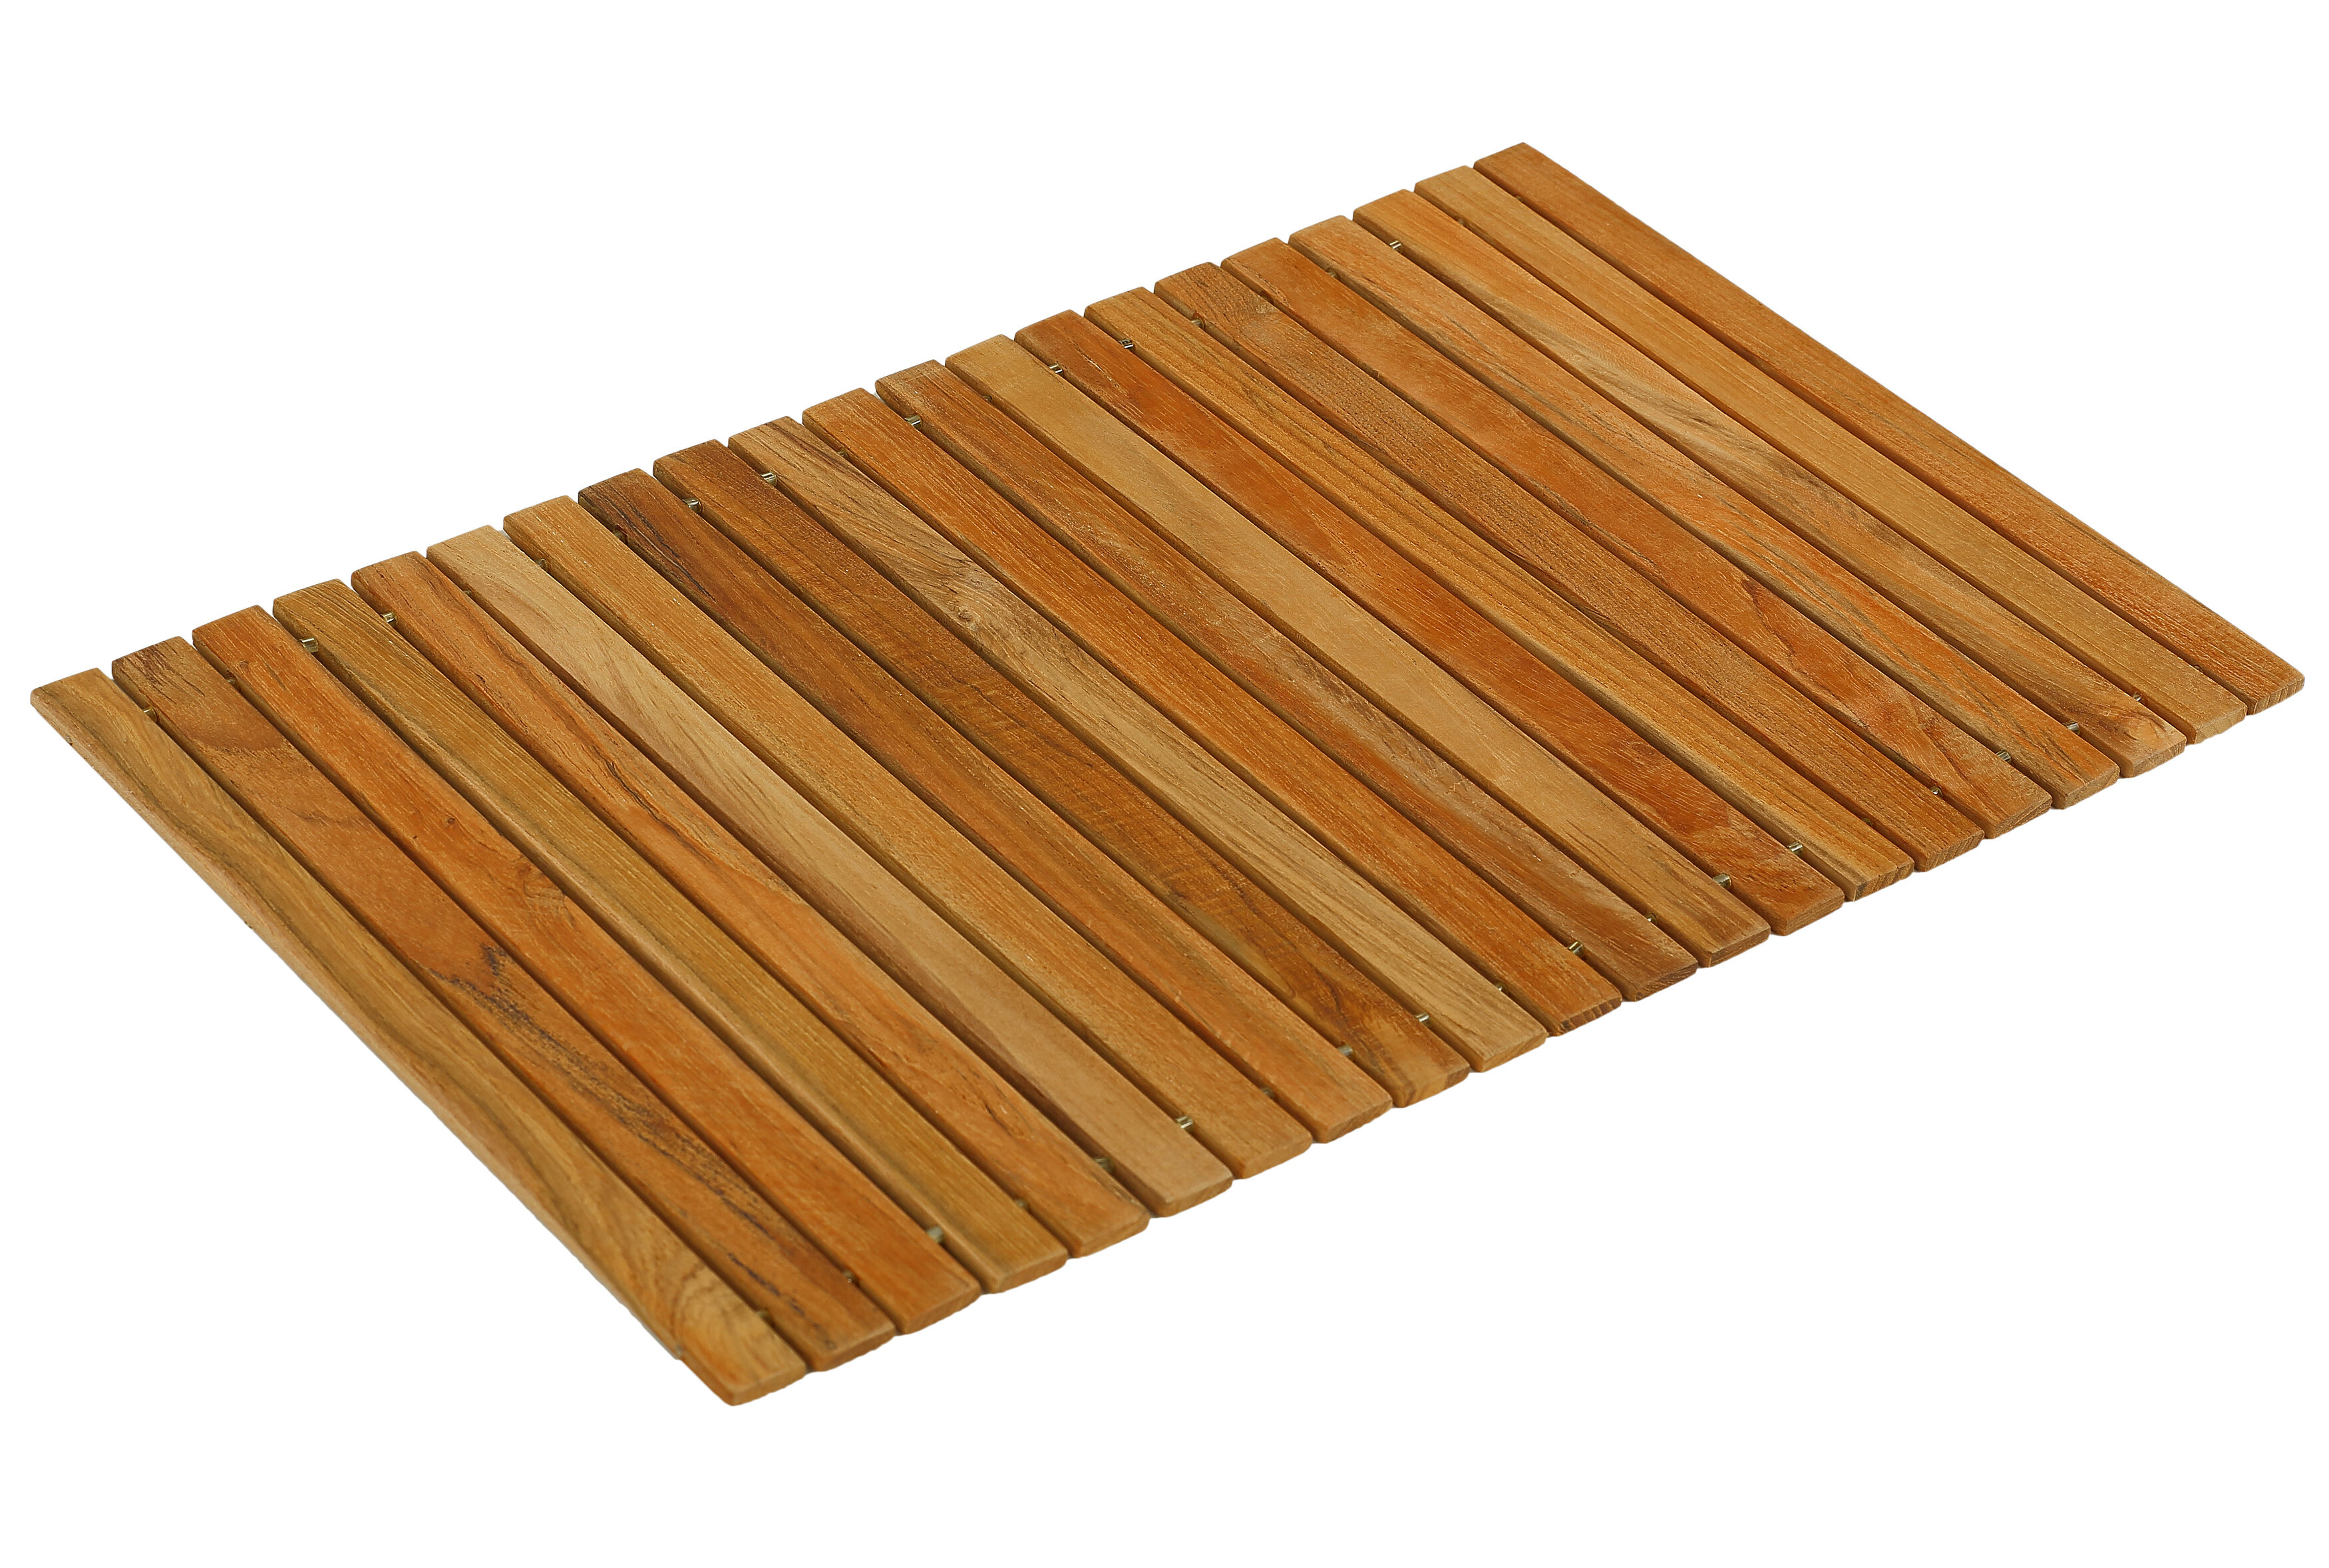 Asi Genuine Teak Wood Flexible Table Top 19 Placemat